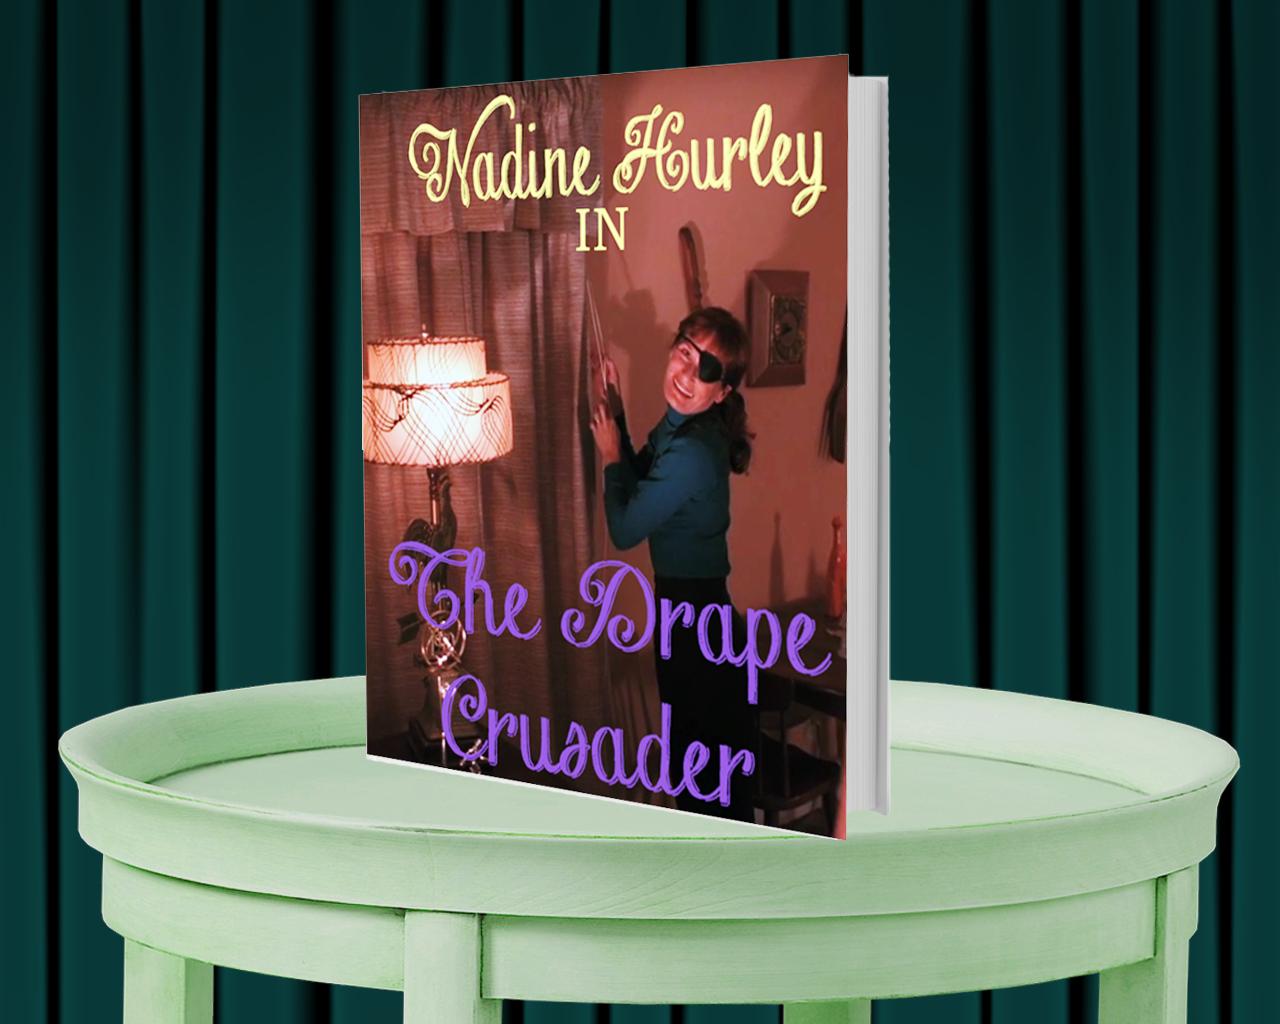 Mock book-cover starring  Twin Peaks  character,  Nadine Hurley